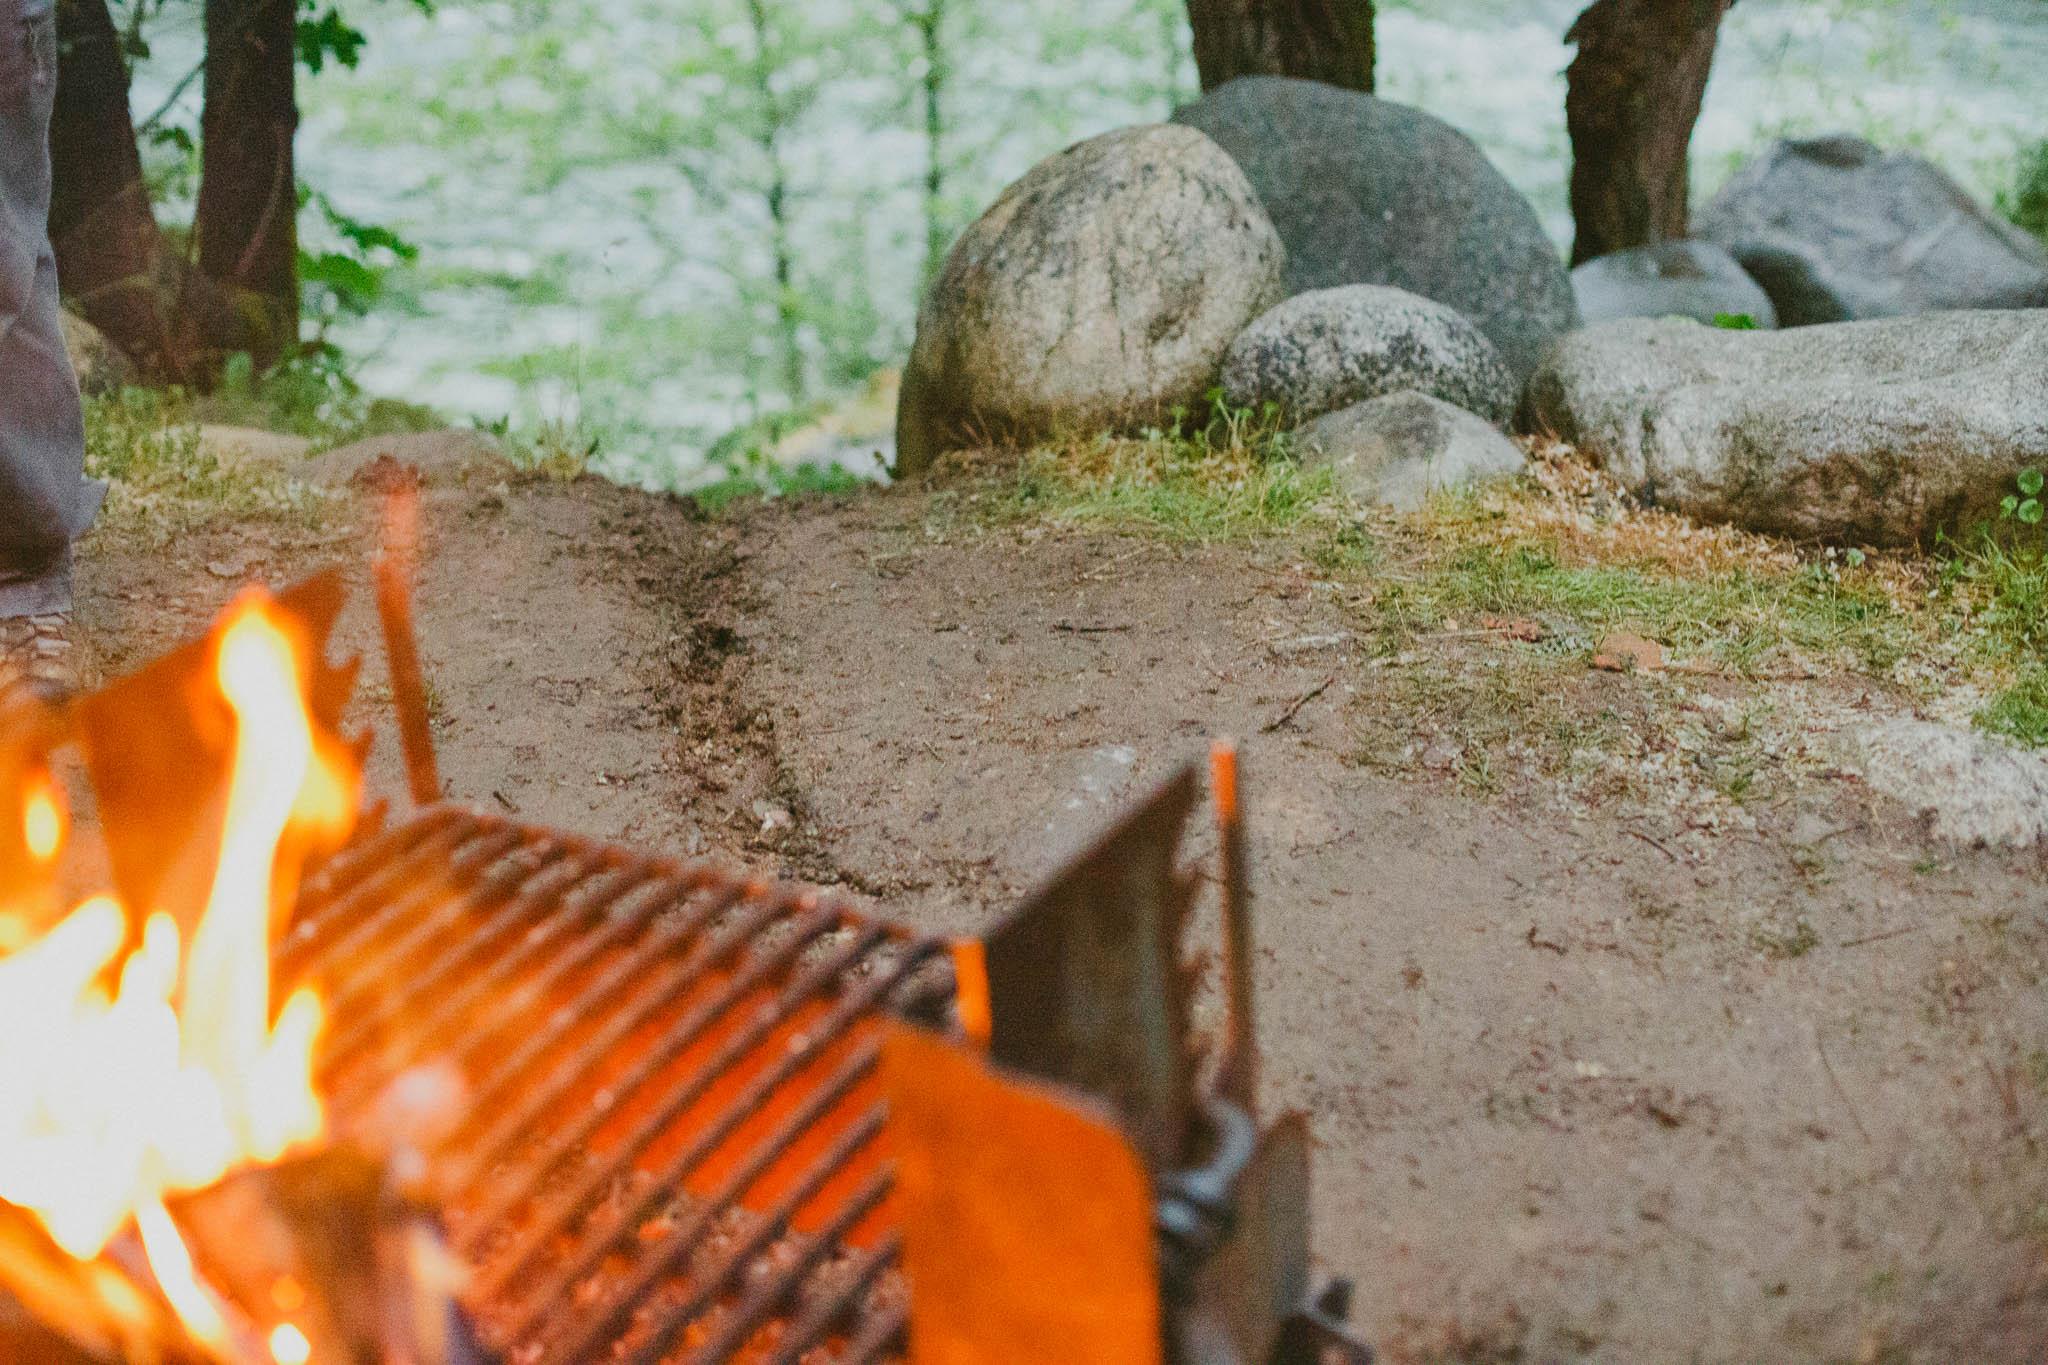 CampingintheRainLenkalandAll Rights Reserved-35.jpg